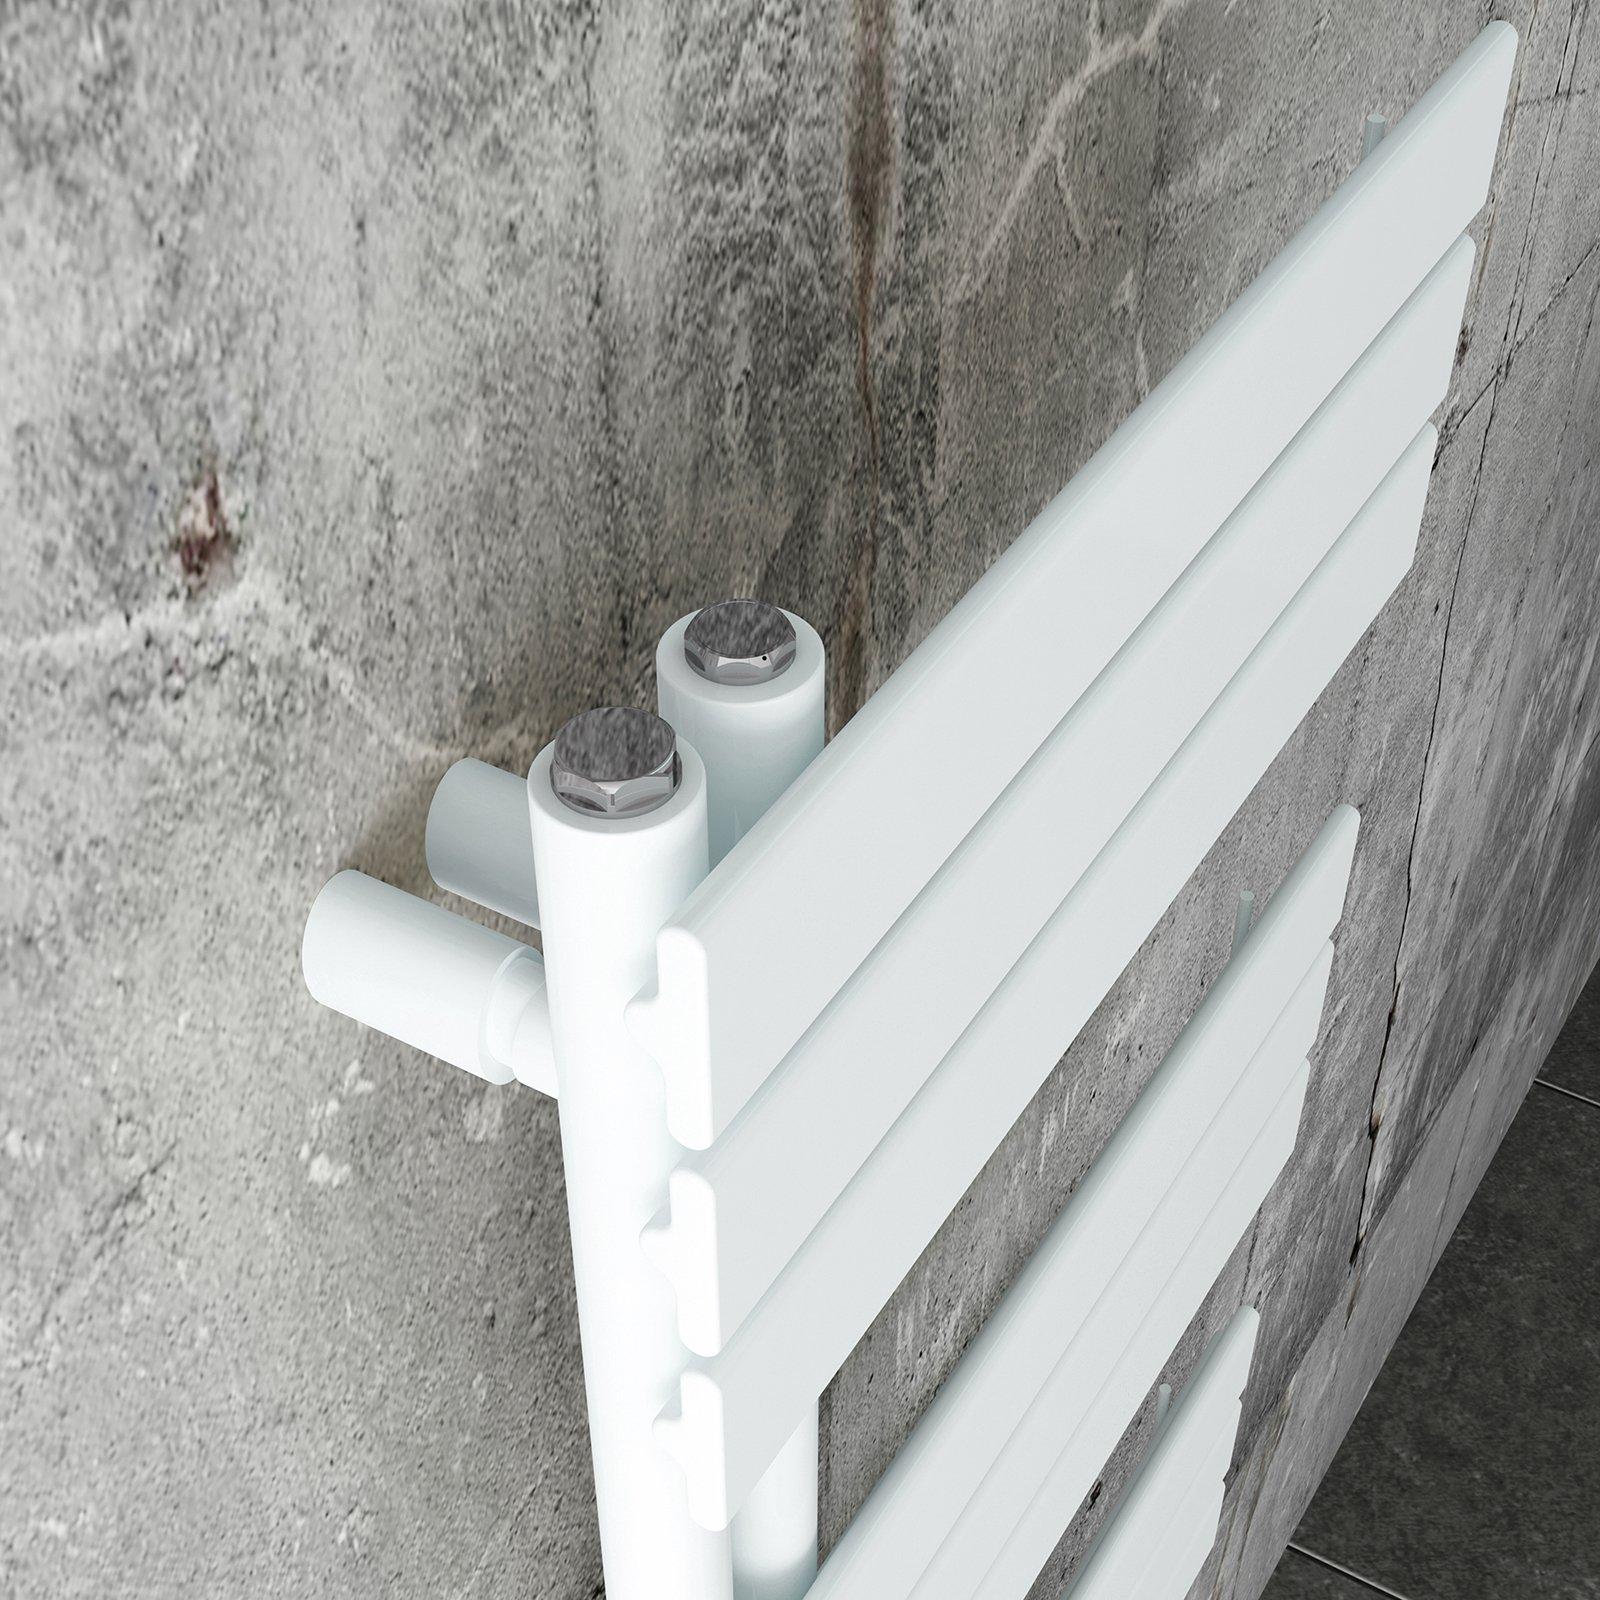 Design Badheizkörper Handtuchwärmer D16W in Weiß - Größe wählbar